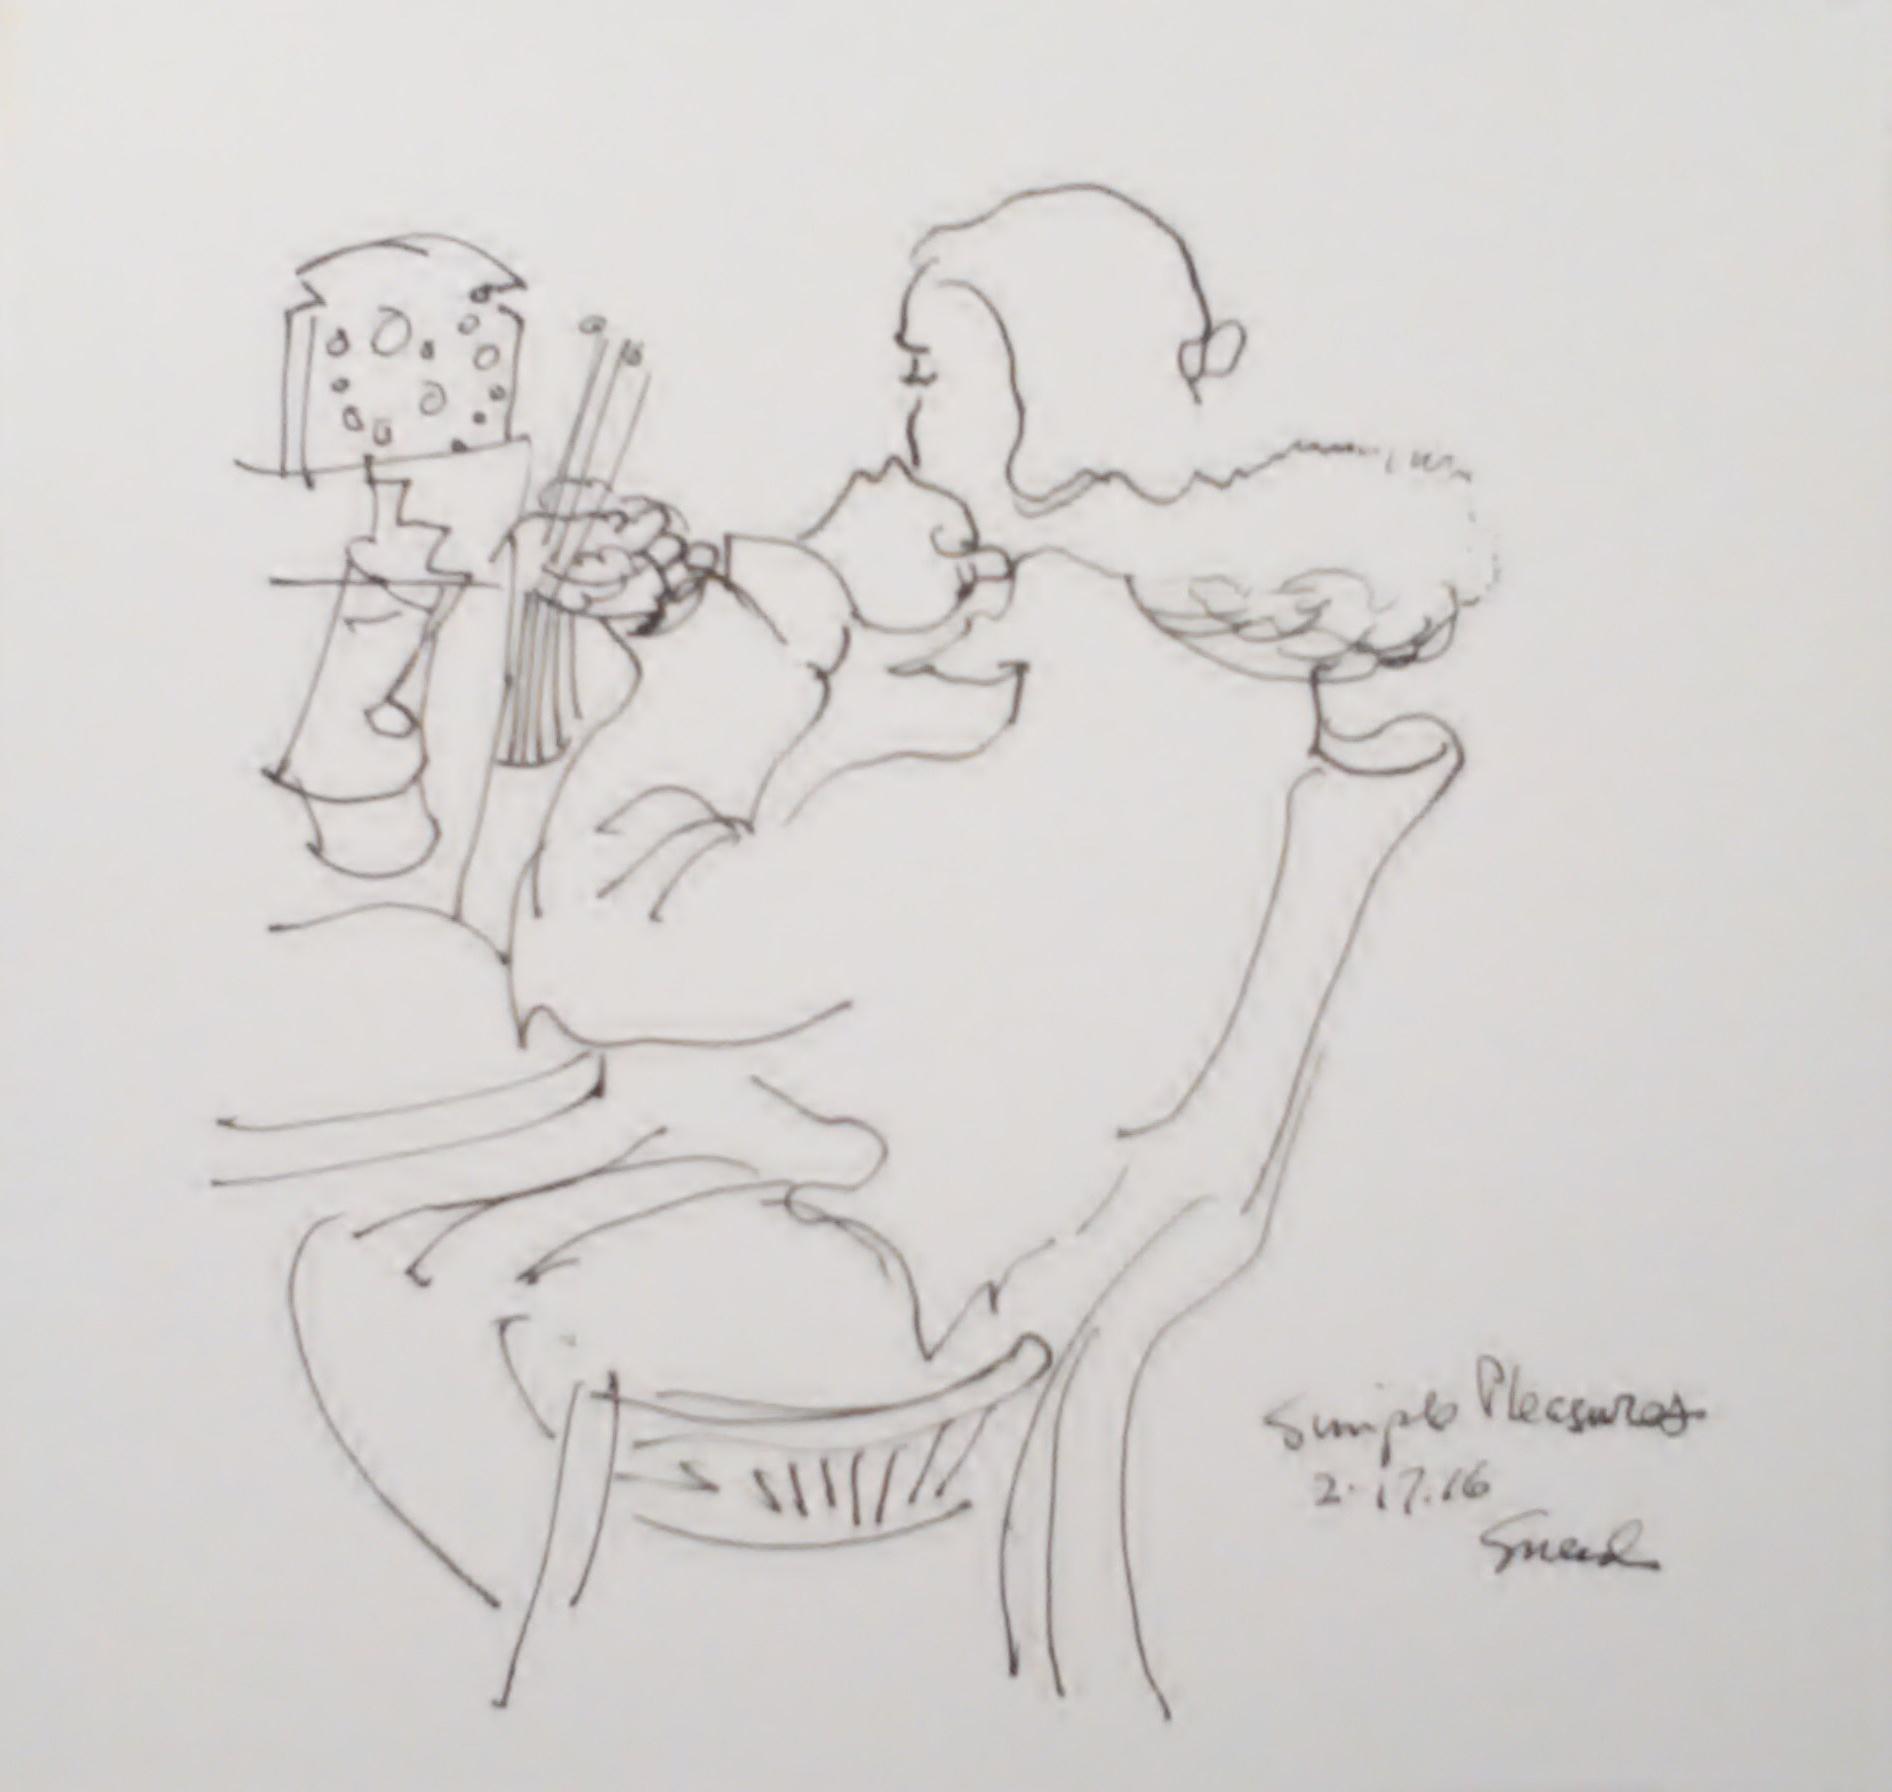 Cafe Simple Pleasures